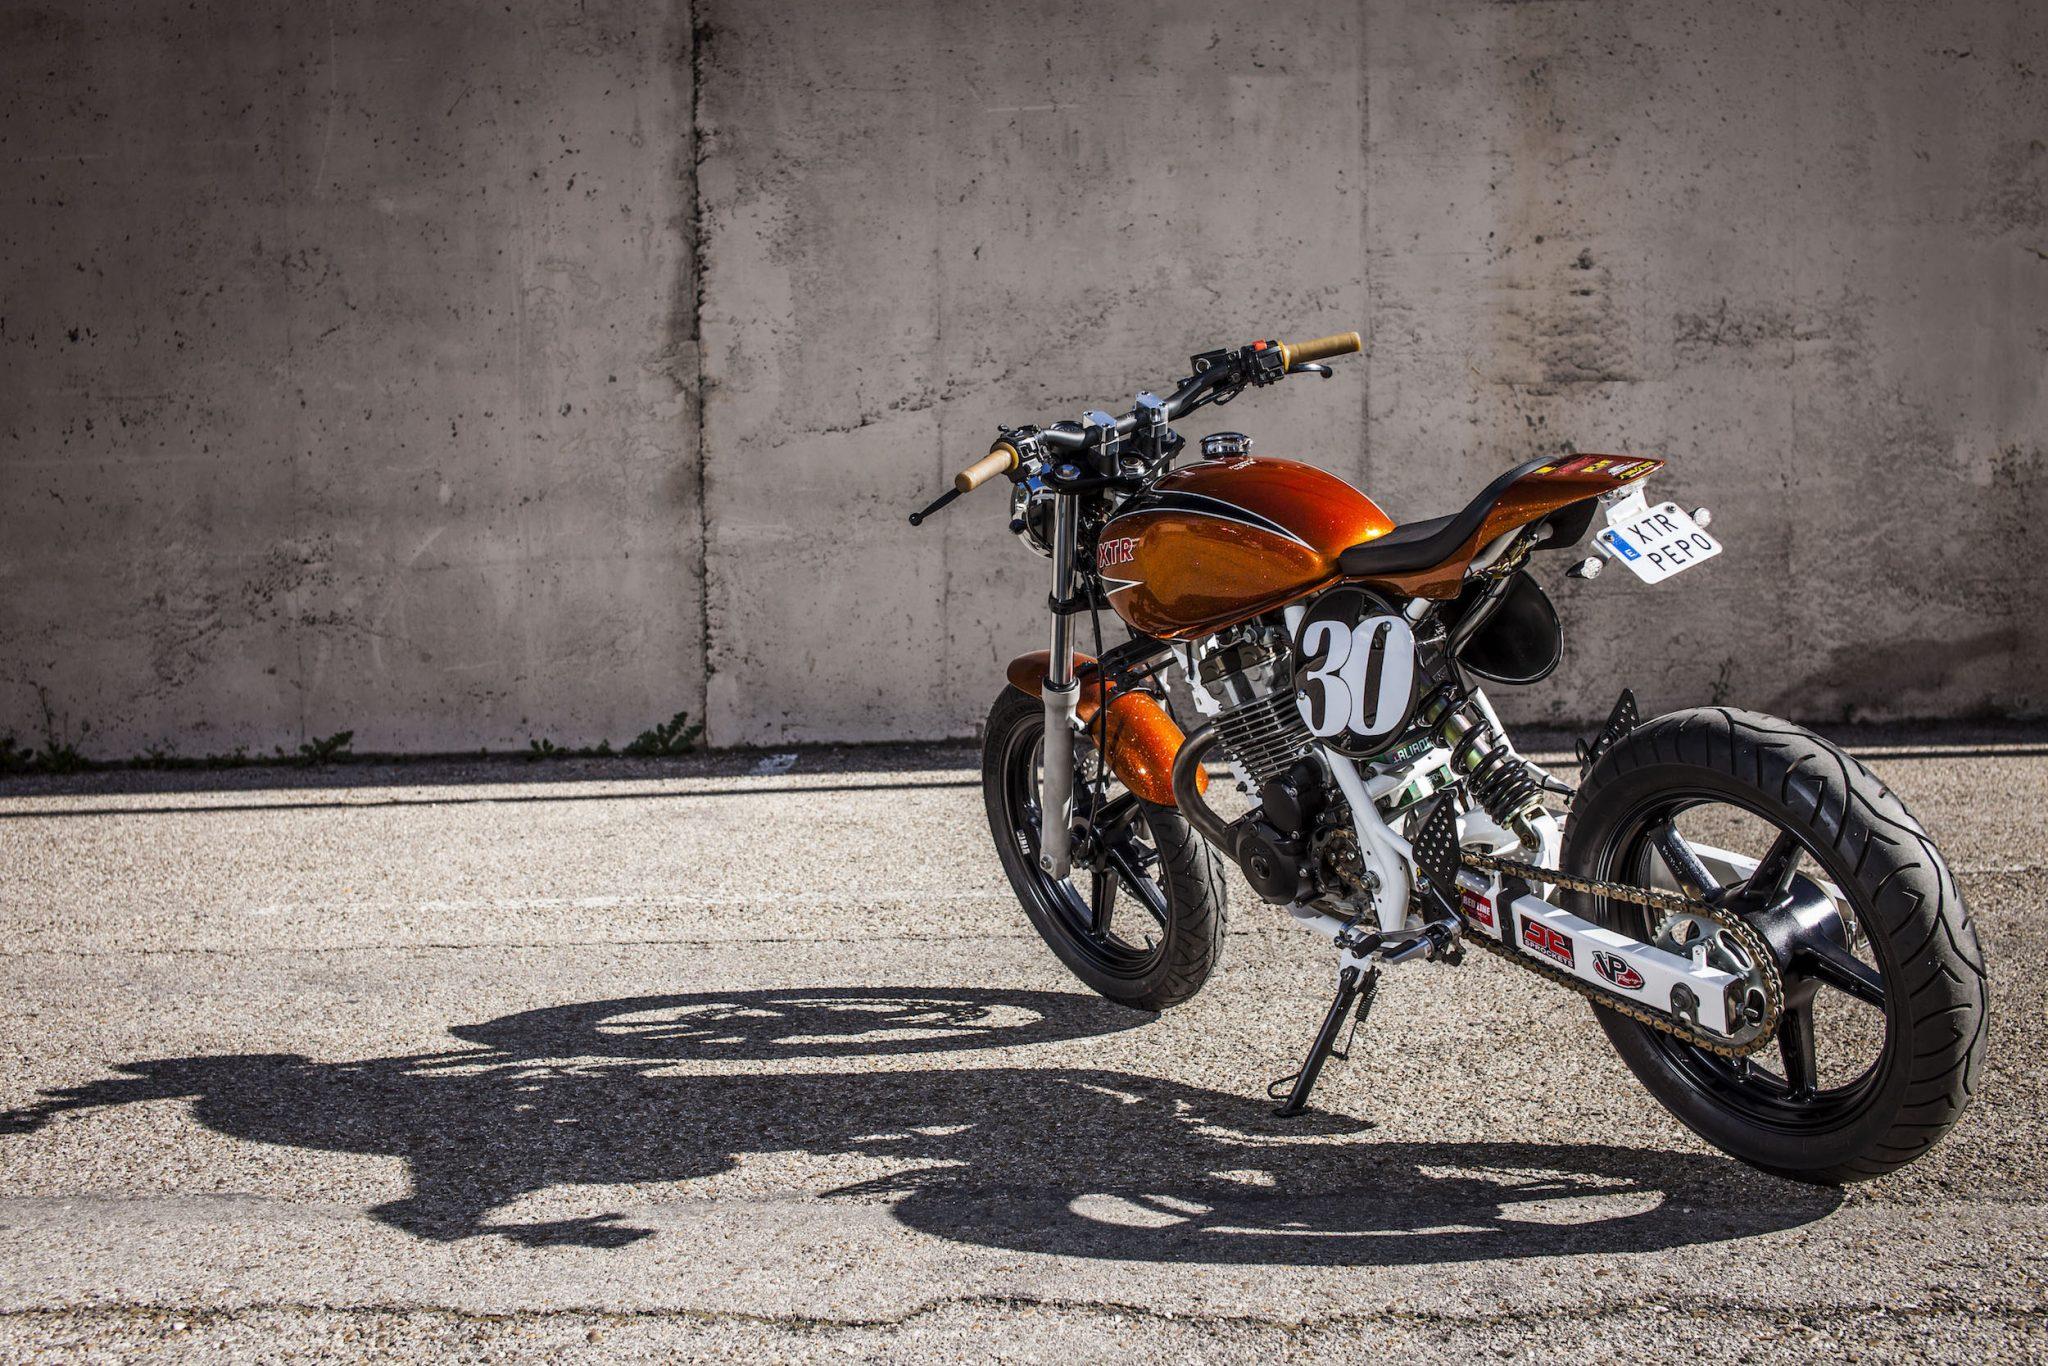 XTR Pepo Honda CBF 250 3 - XTR Pepo Honda CBF 250 Tracker